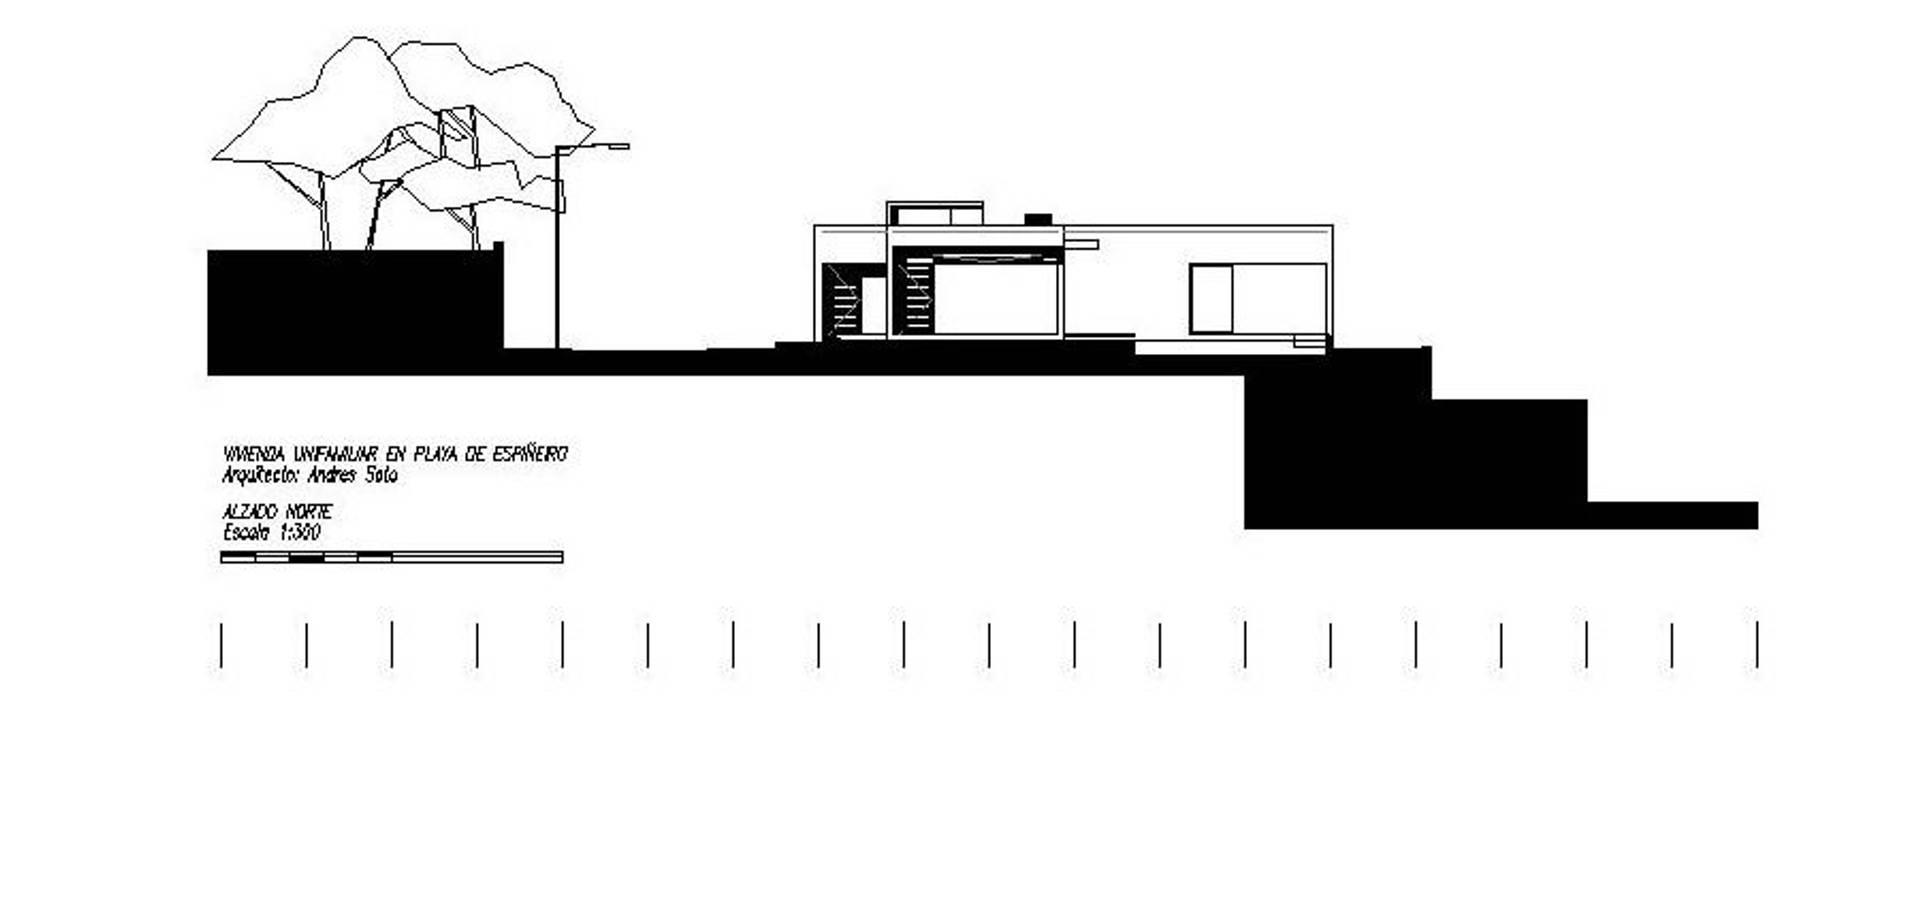 EPB42 Arquitectura y Planeamiento, S.L